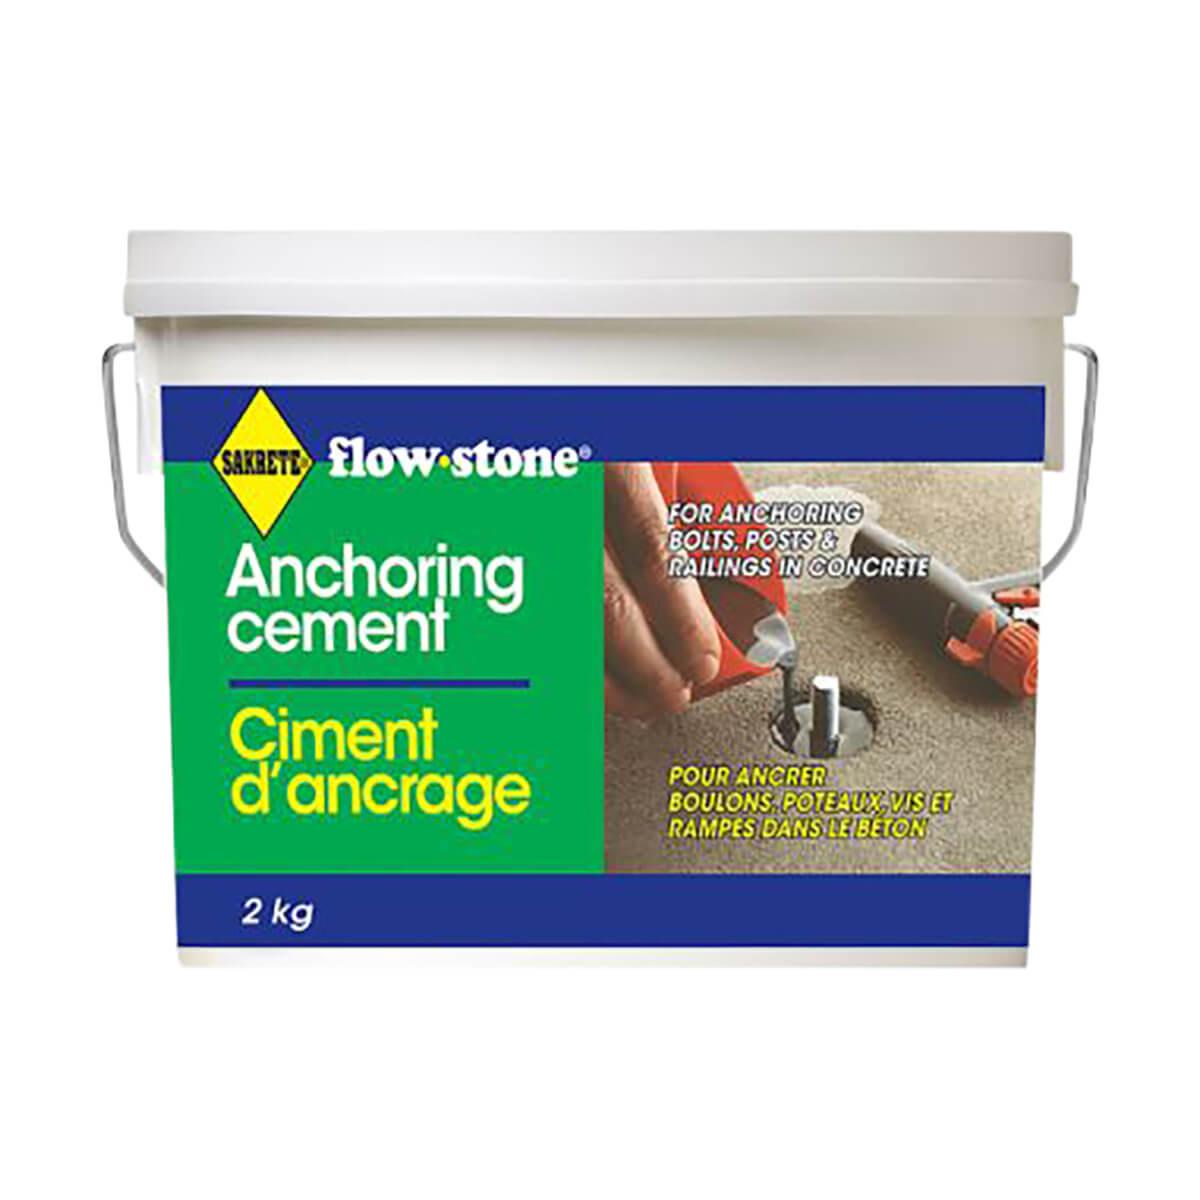 Cement - Anchoring - 4.4 lb